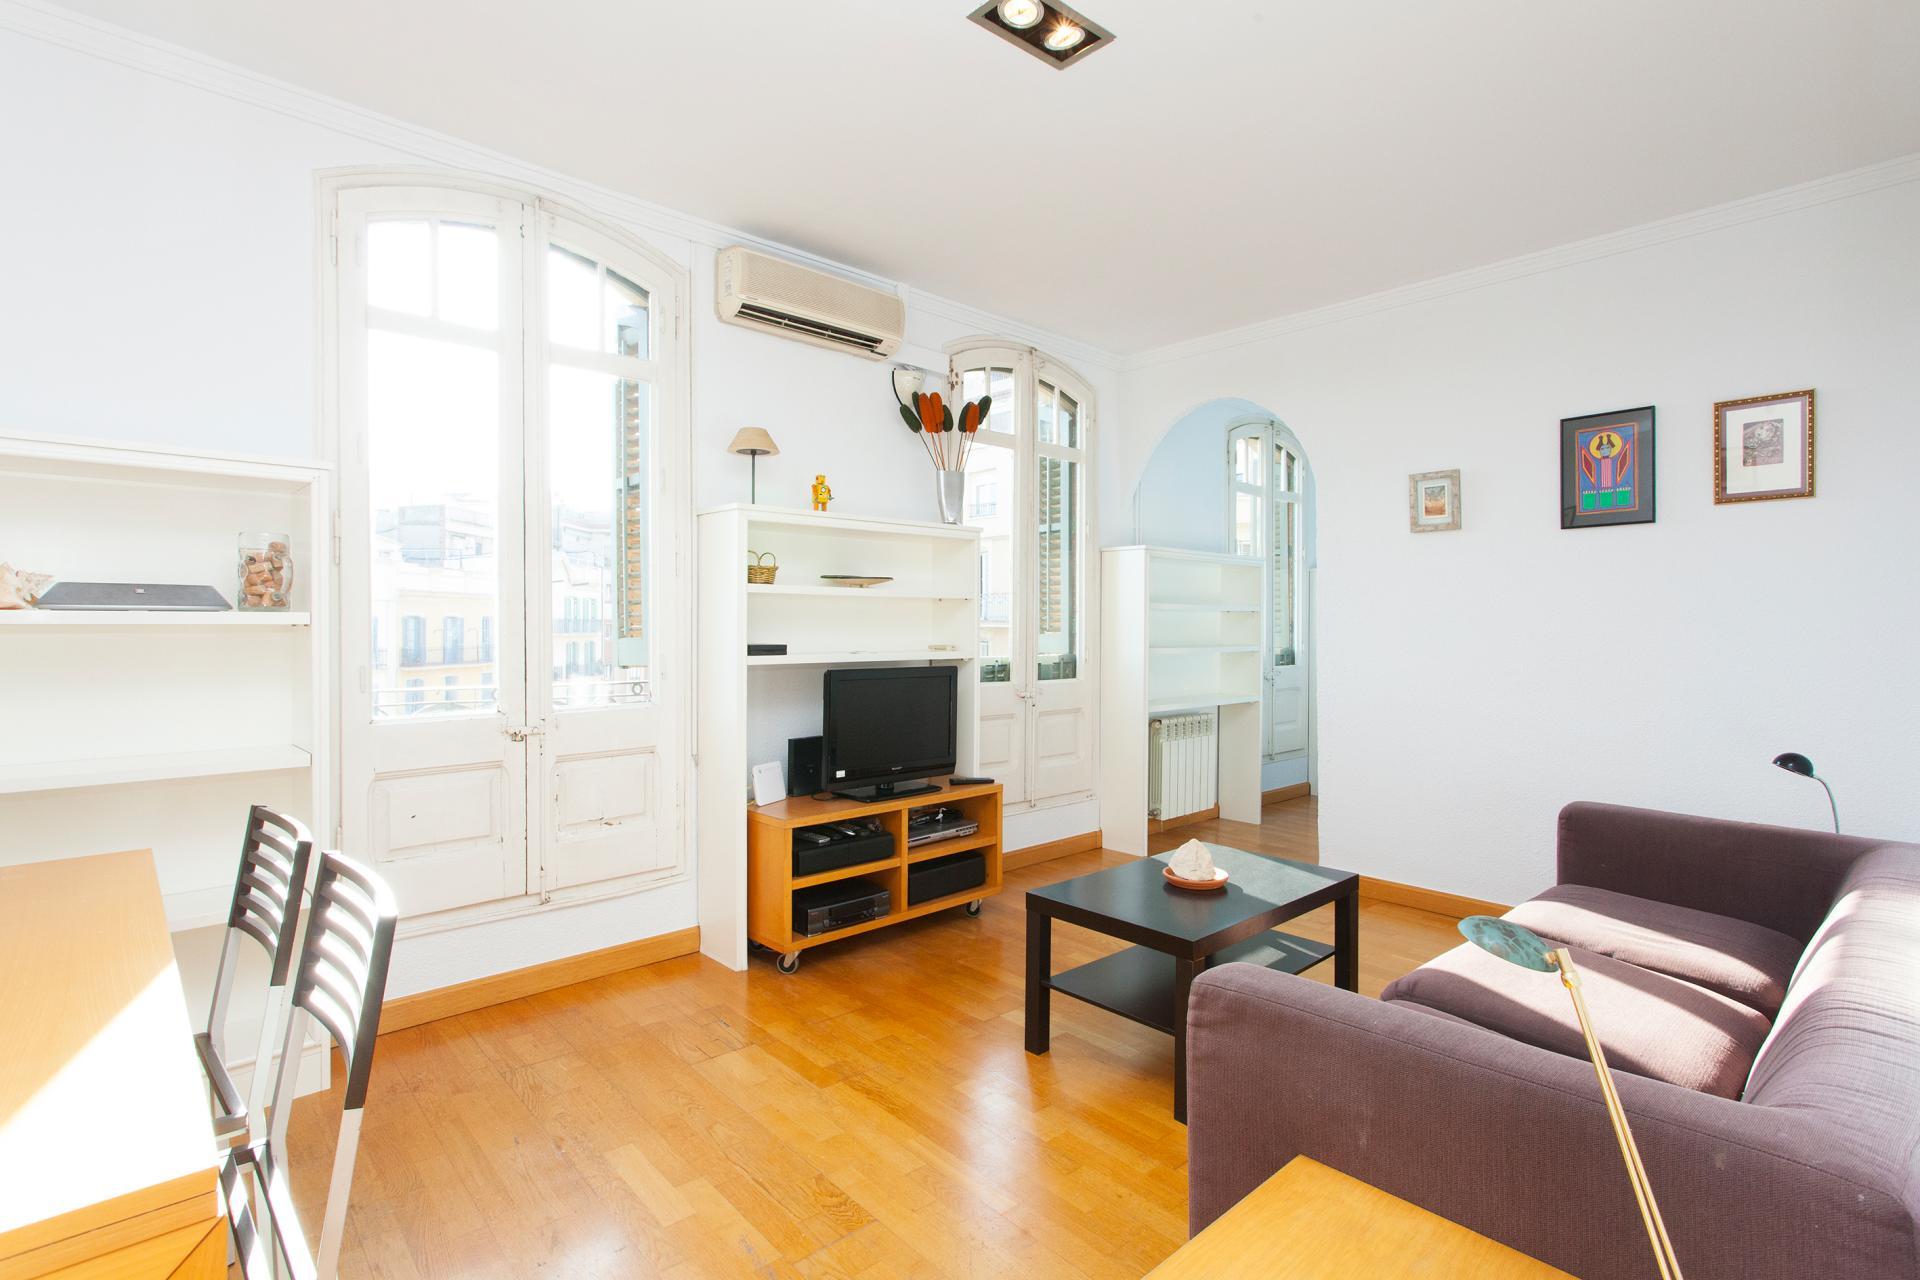 Shbarcelona alquiler piso junto a sagrada familia eixample - Piso alquiler sagrada familia ...